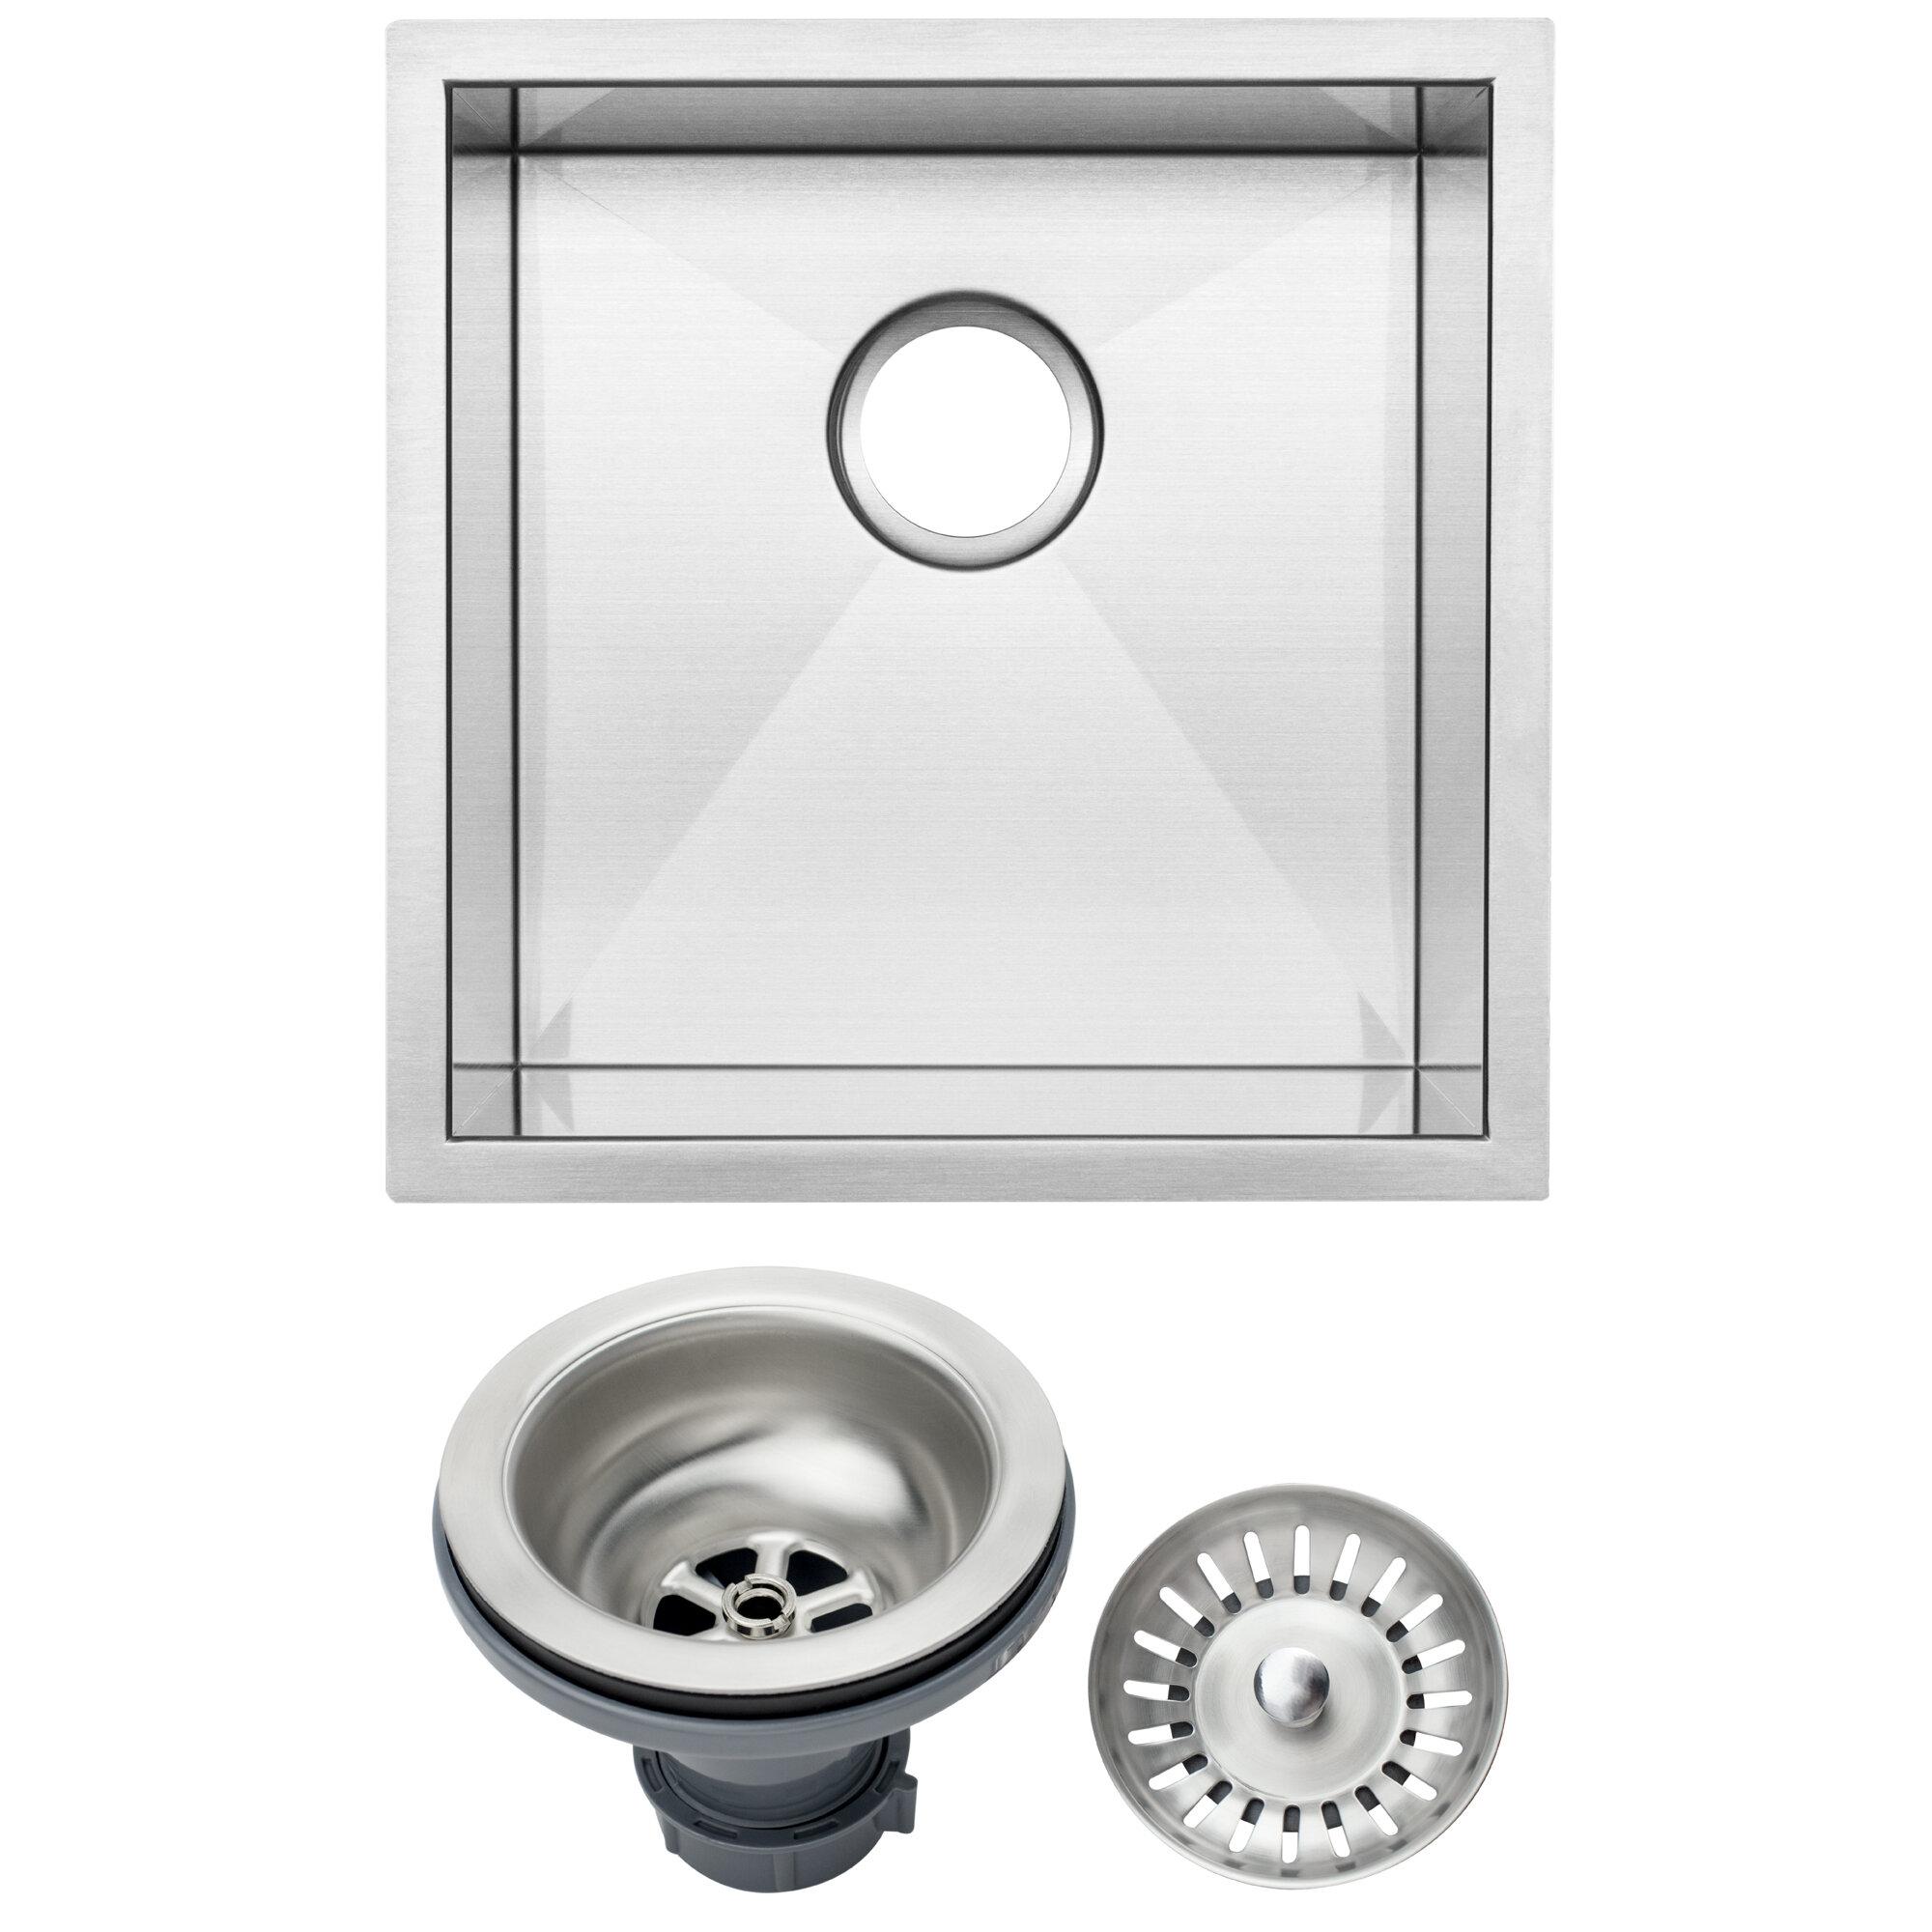 "S3640BG-DEL Ticor 17-1/4"" L X 17-1/2"" W Inch Zero Radius 16 Gauge Stainless Steel Single Bowl Square Undermount Kitchen Bar Sink"